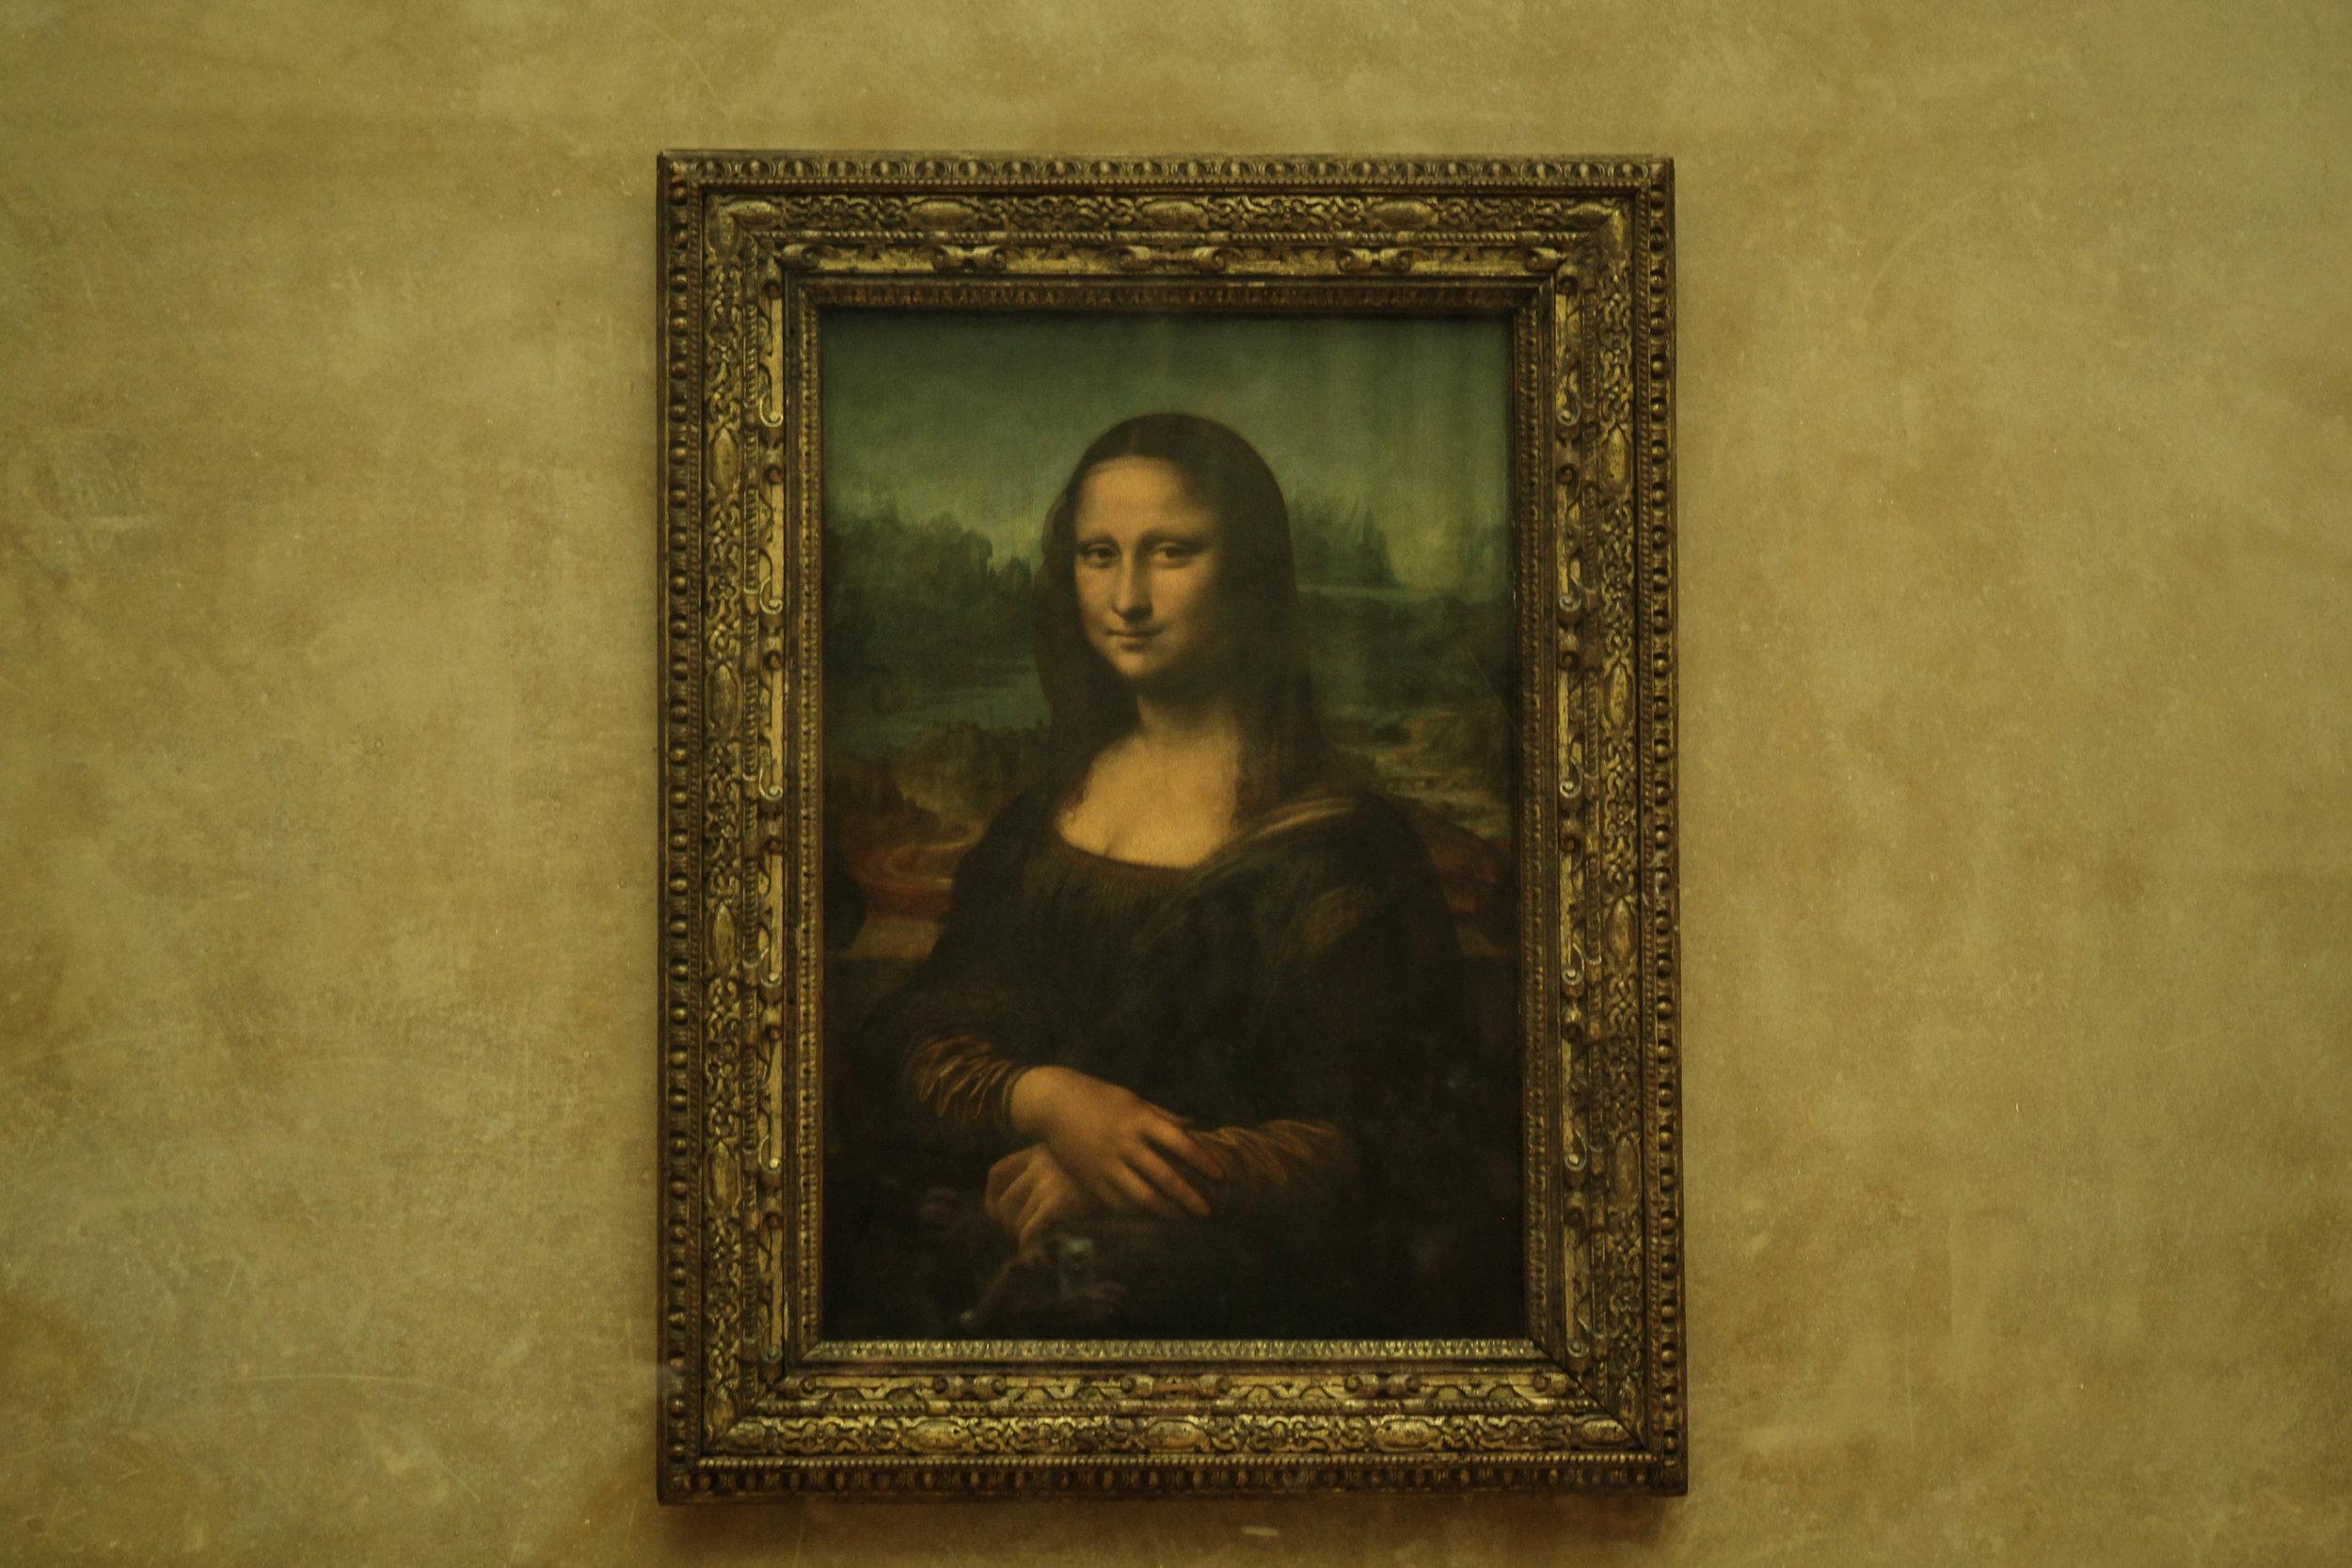 Mona Lisa - Eric Bravo Photography